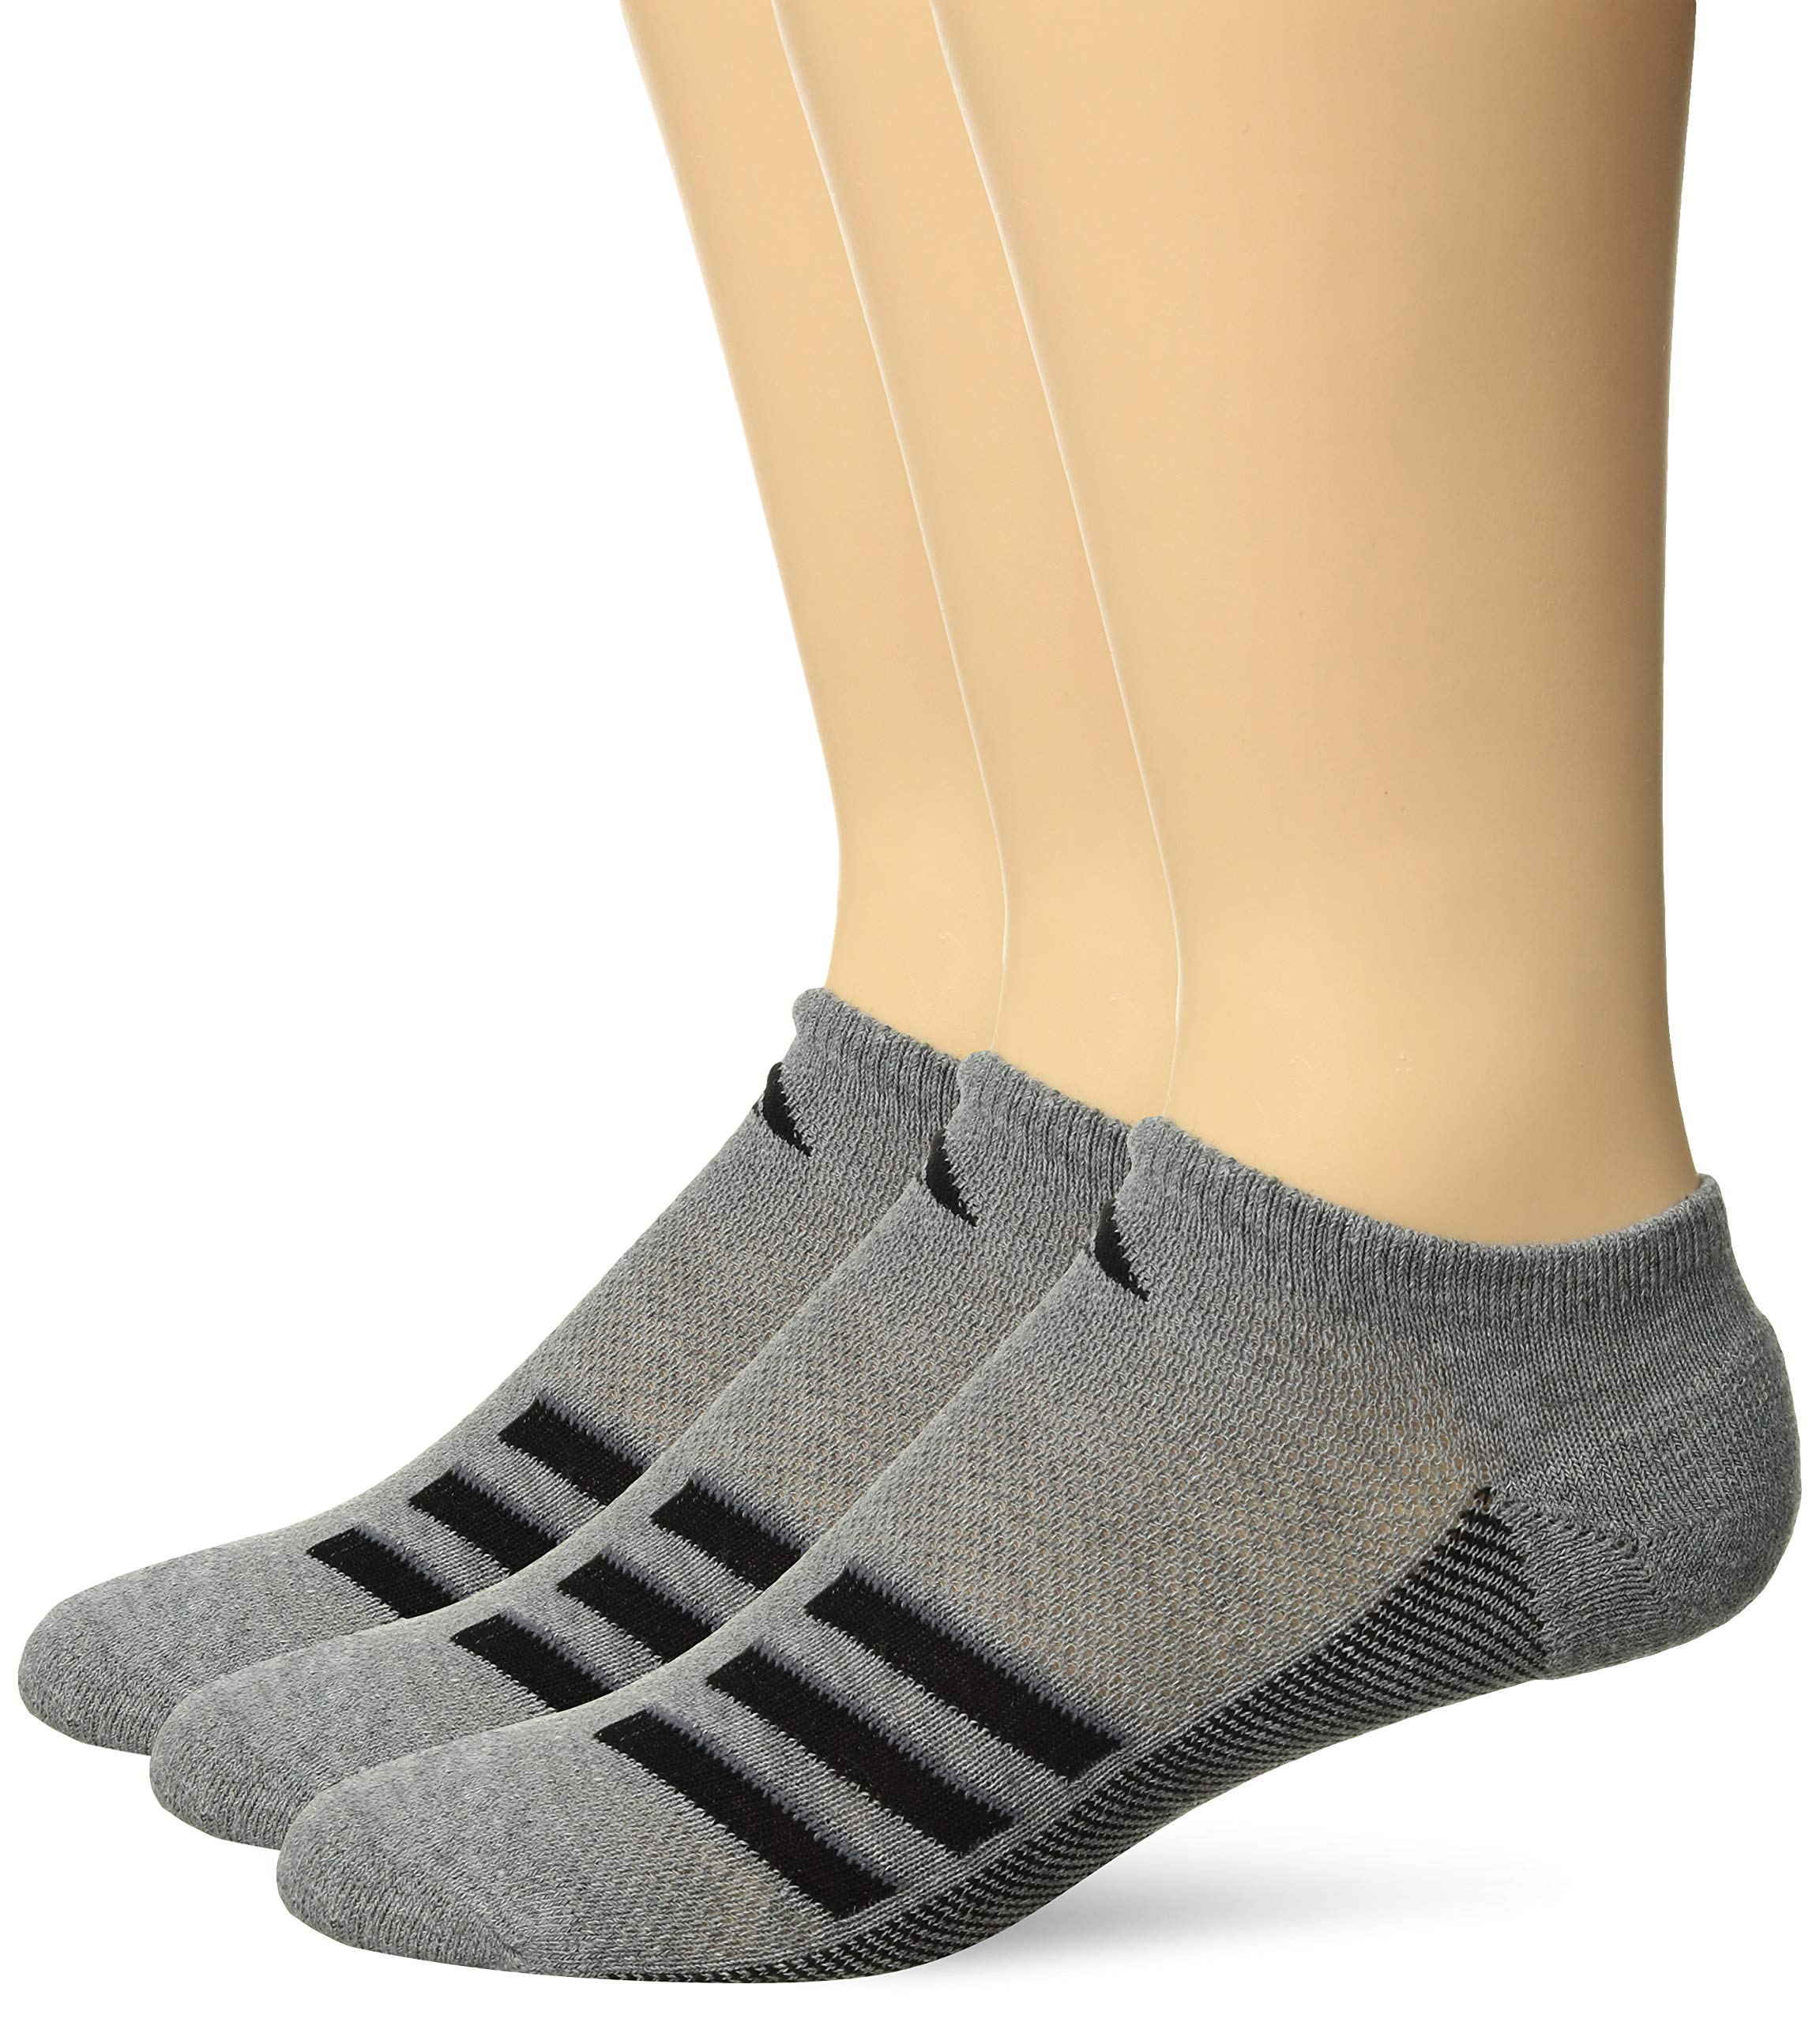 adidas Men's Climacool Superlite No Show Socks (3-Pack), Core Heather/Black/Onix, Size 6-12